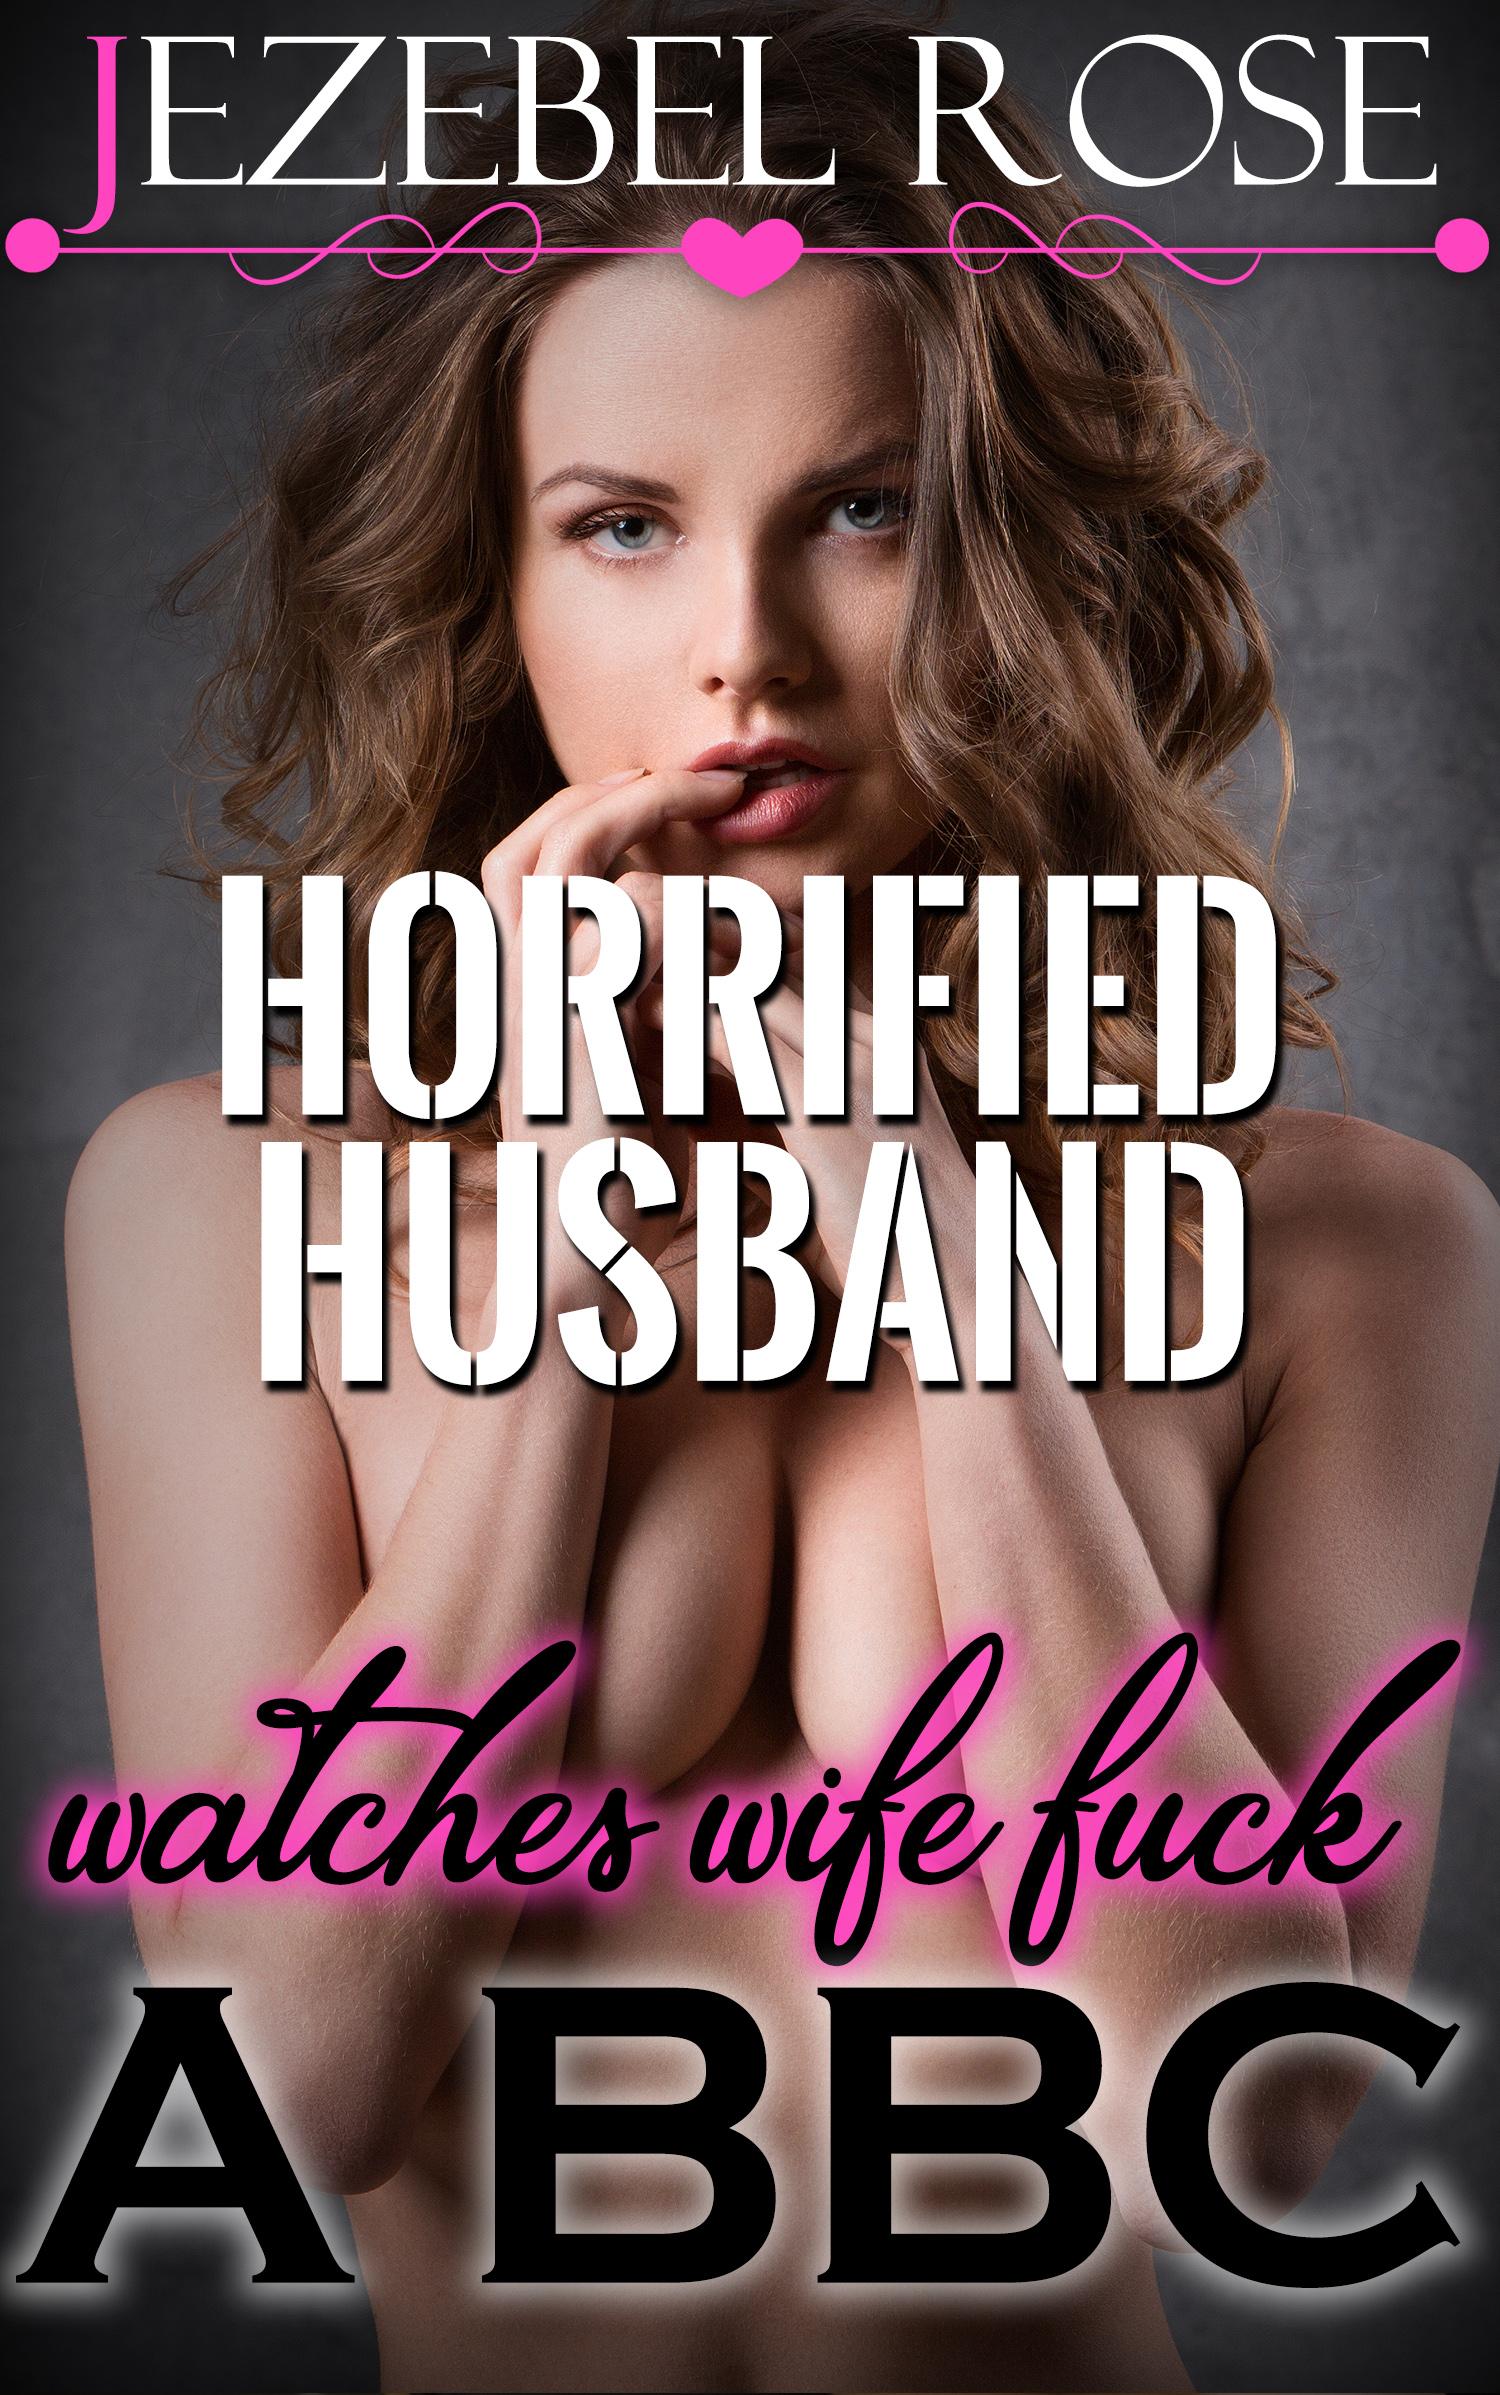 Smashwords – Horrified Husband Watches Wife Fuck a BBC – a ...